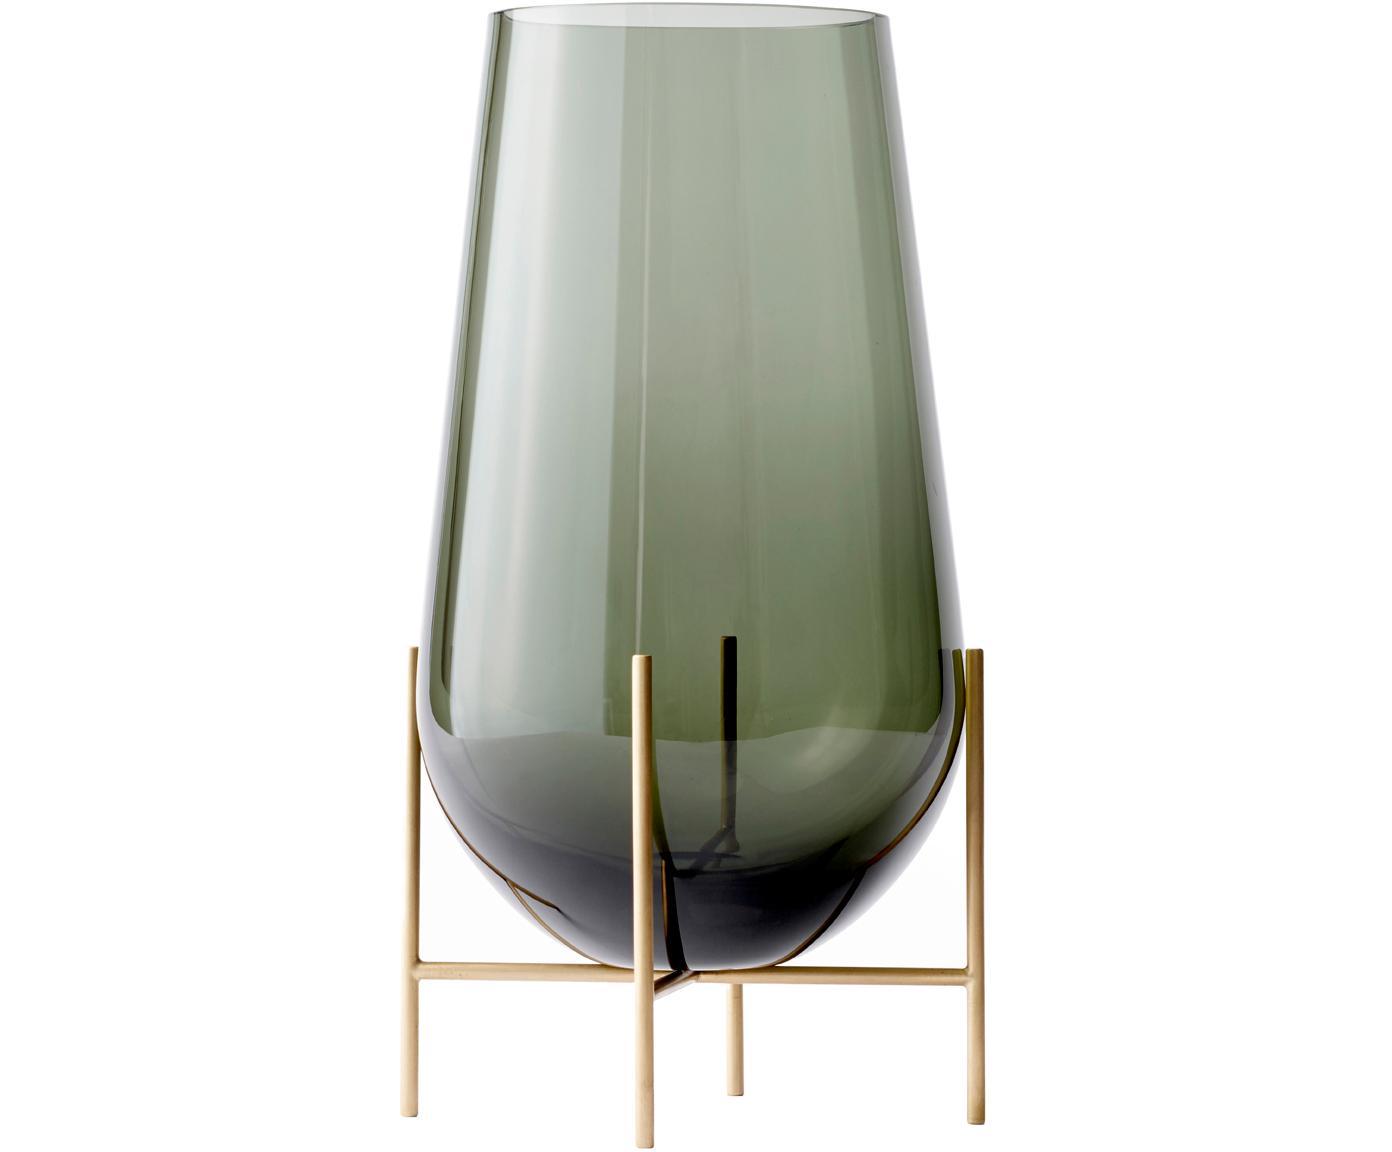 Grosse Design-Vase Échasse, Gestell: Messing, Vase: Glas, mundgeblasen, Messingfarben, Ø 15 x H 45 cm